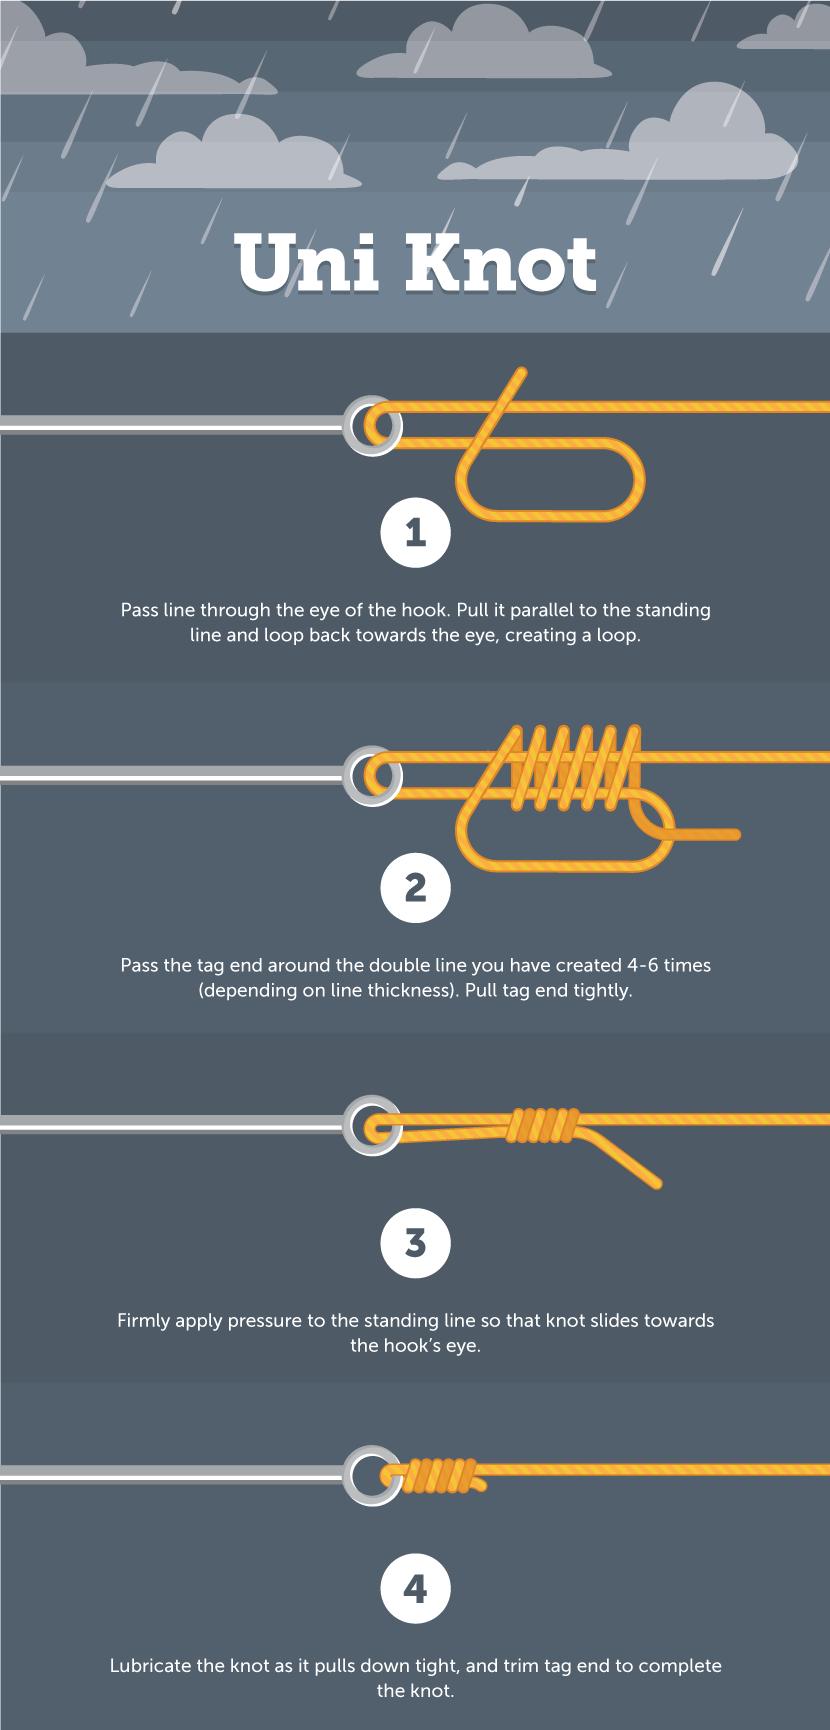 Fishing knots - for tying hooks